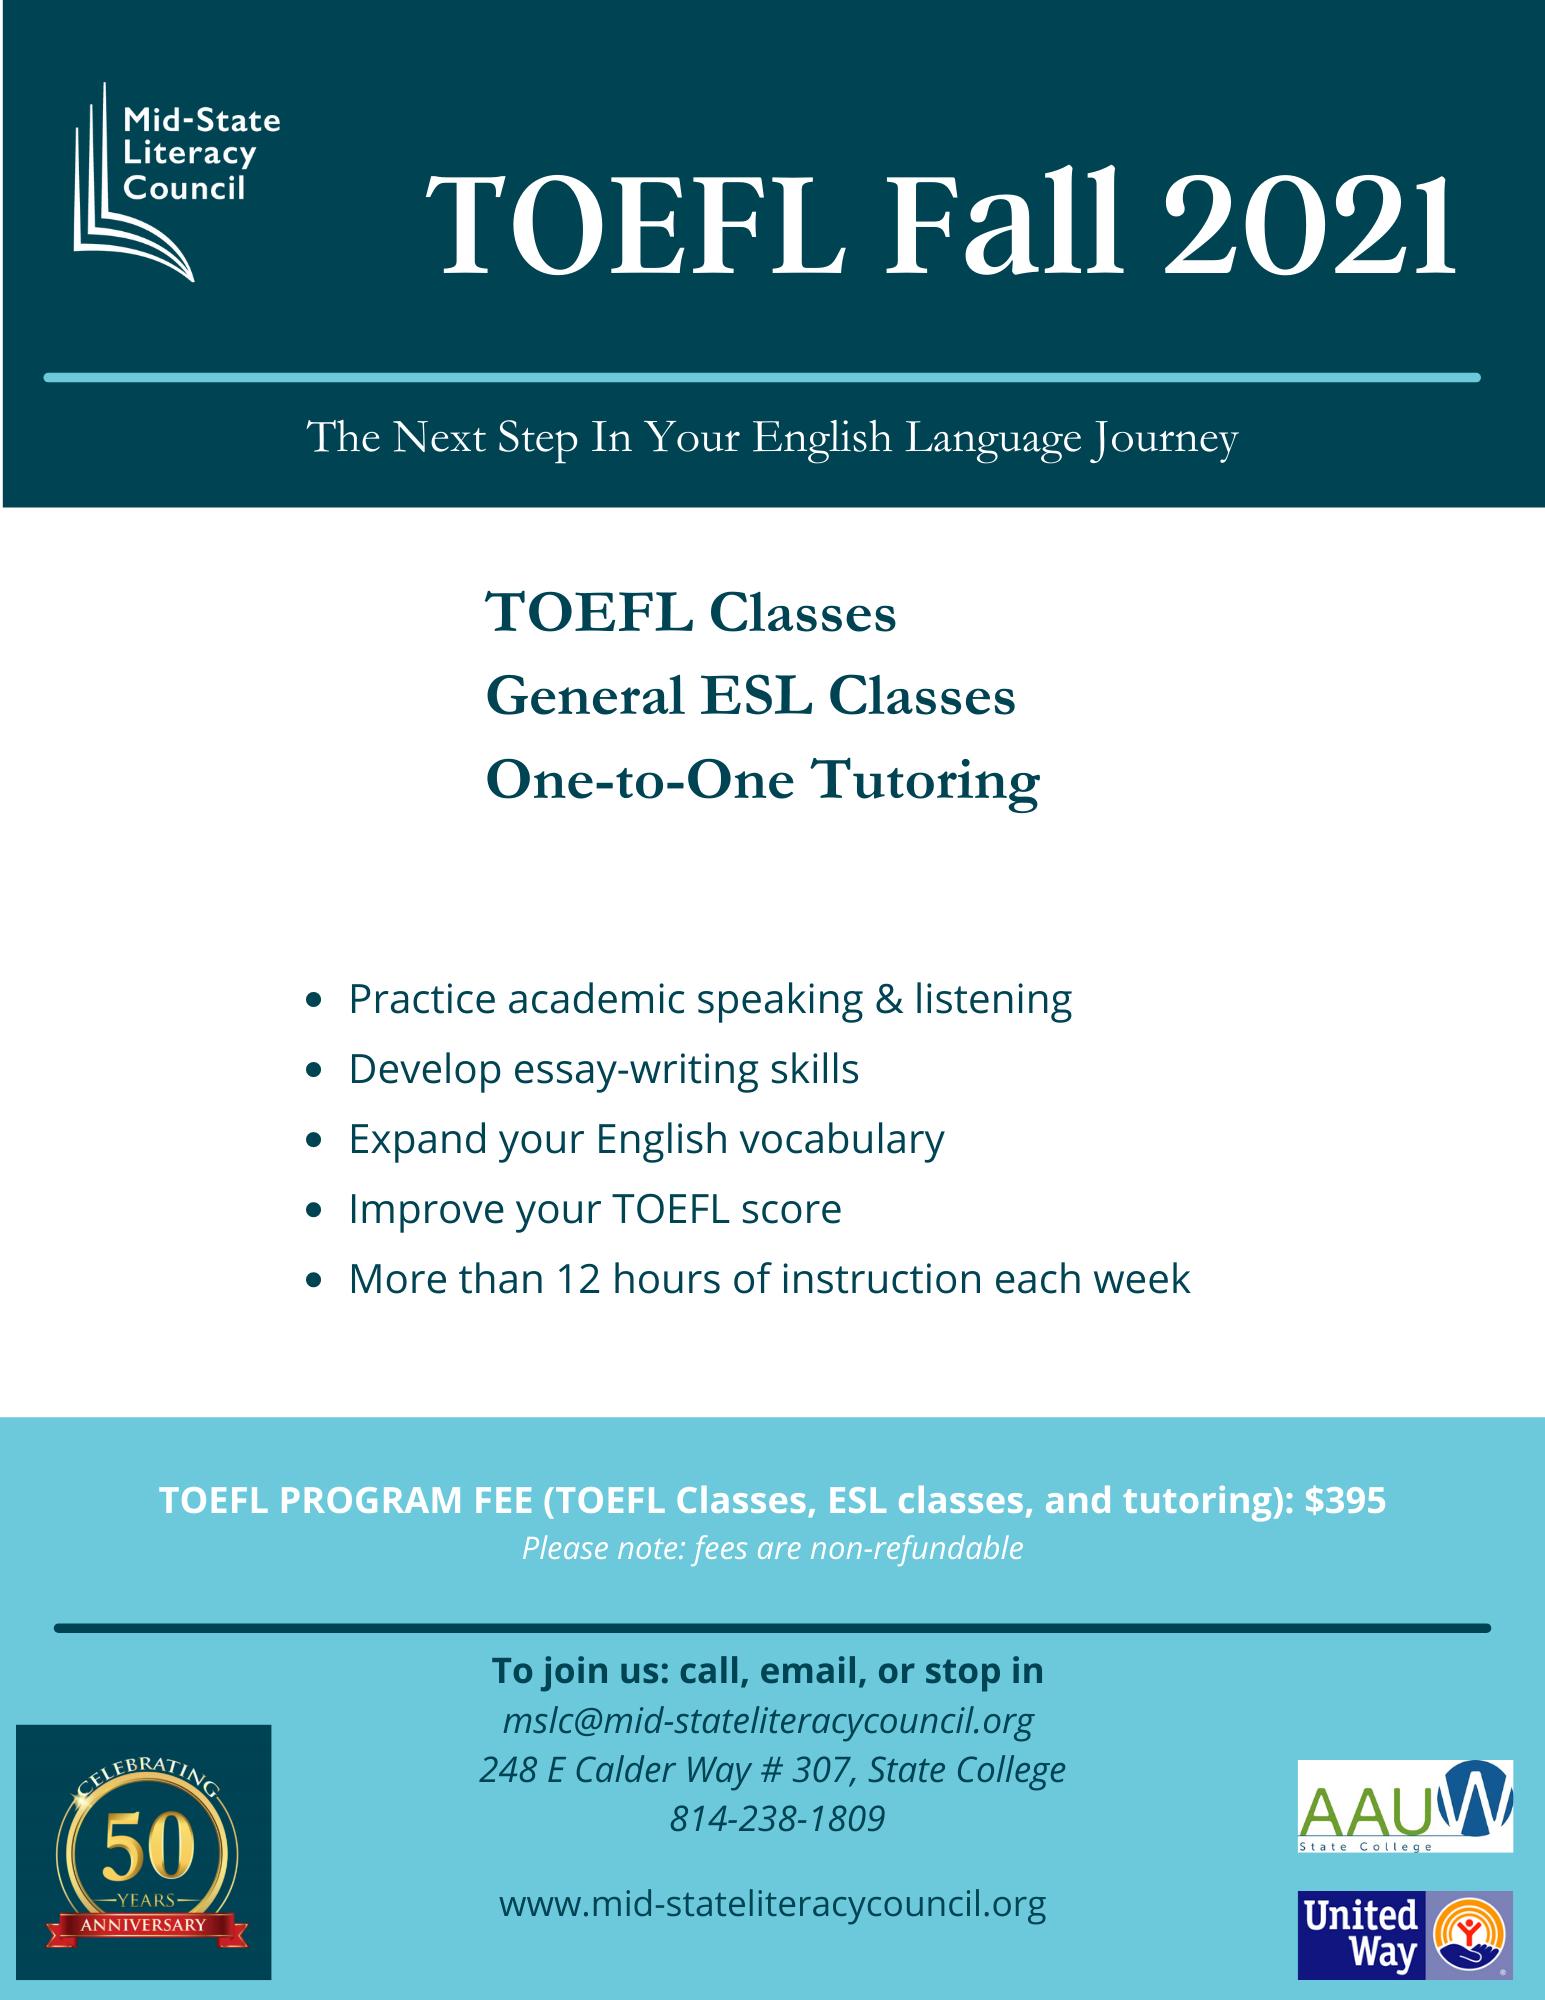 TOEFL Program